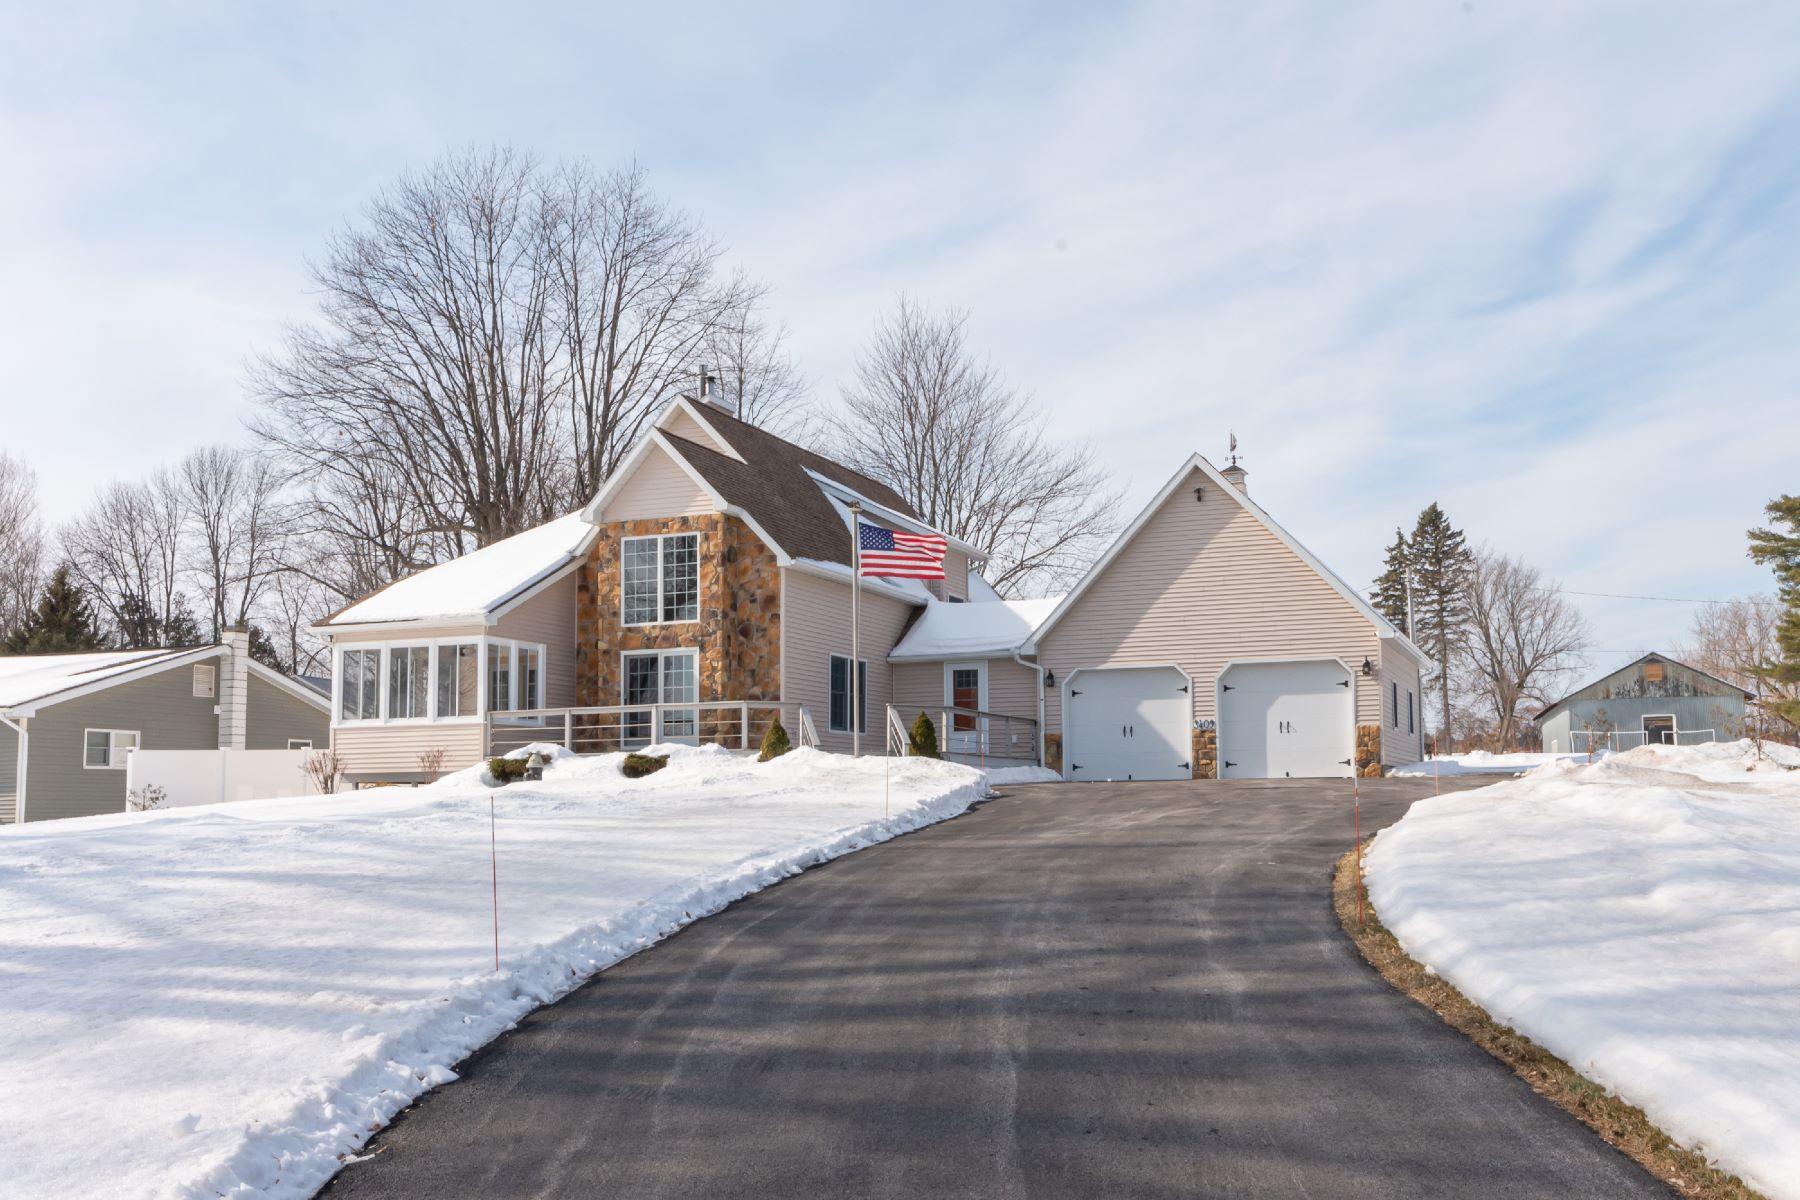 Single Family Homes for Sale at Lake Champlain Turn Key Home 3409 U.S. 9 Peru, New York 12972 United States